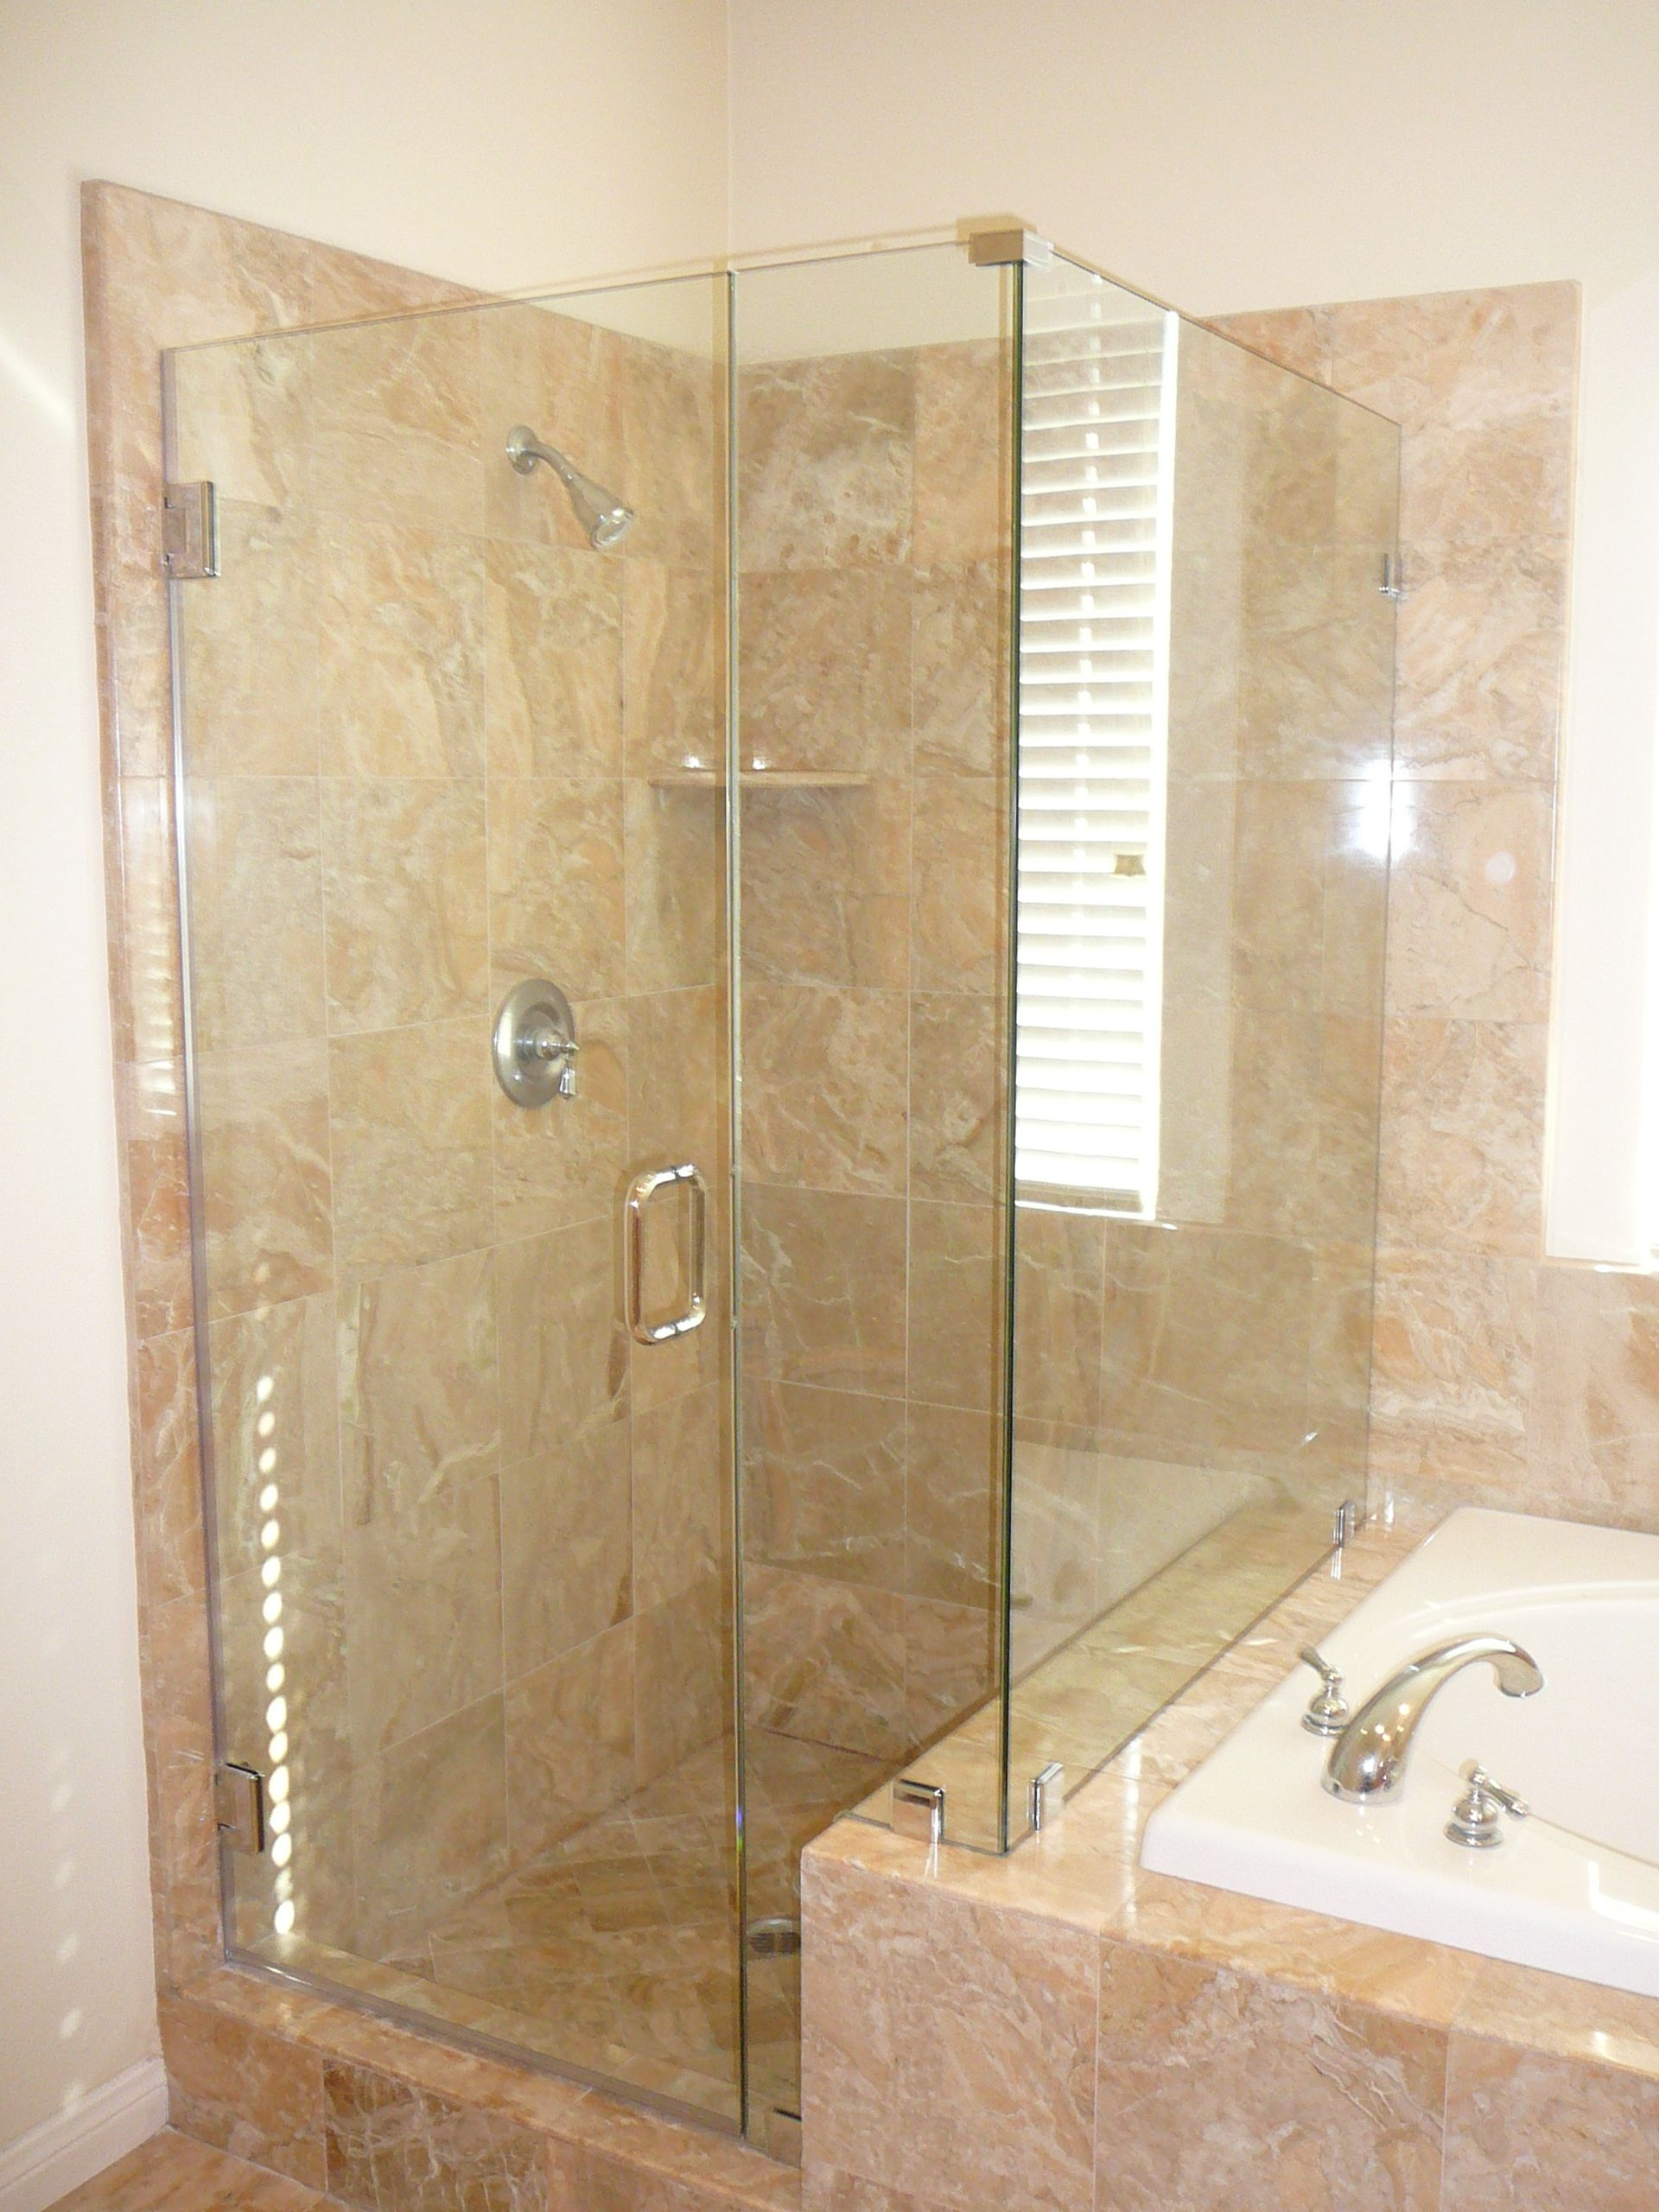 Custom Frameless 90 Shower Enclosure With A Notch Panel Shower